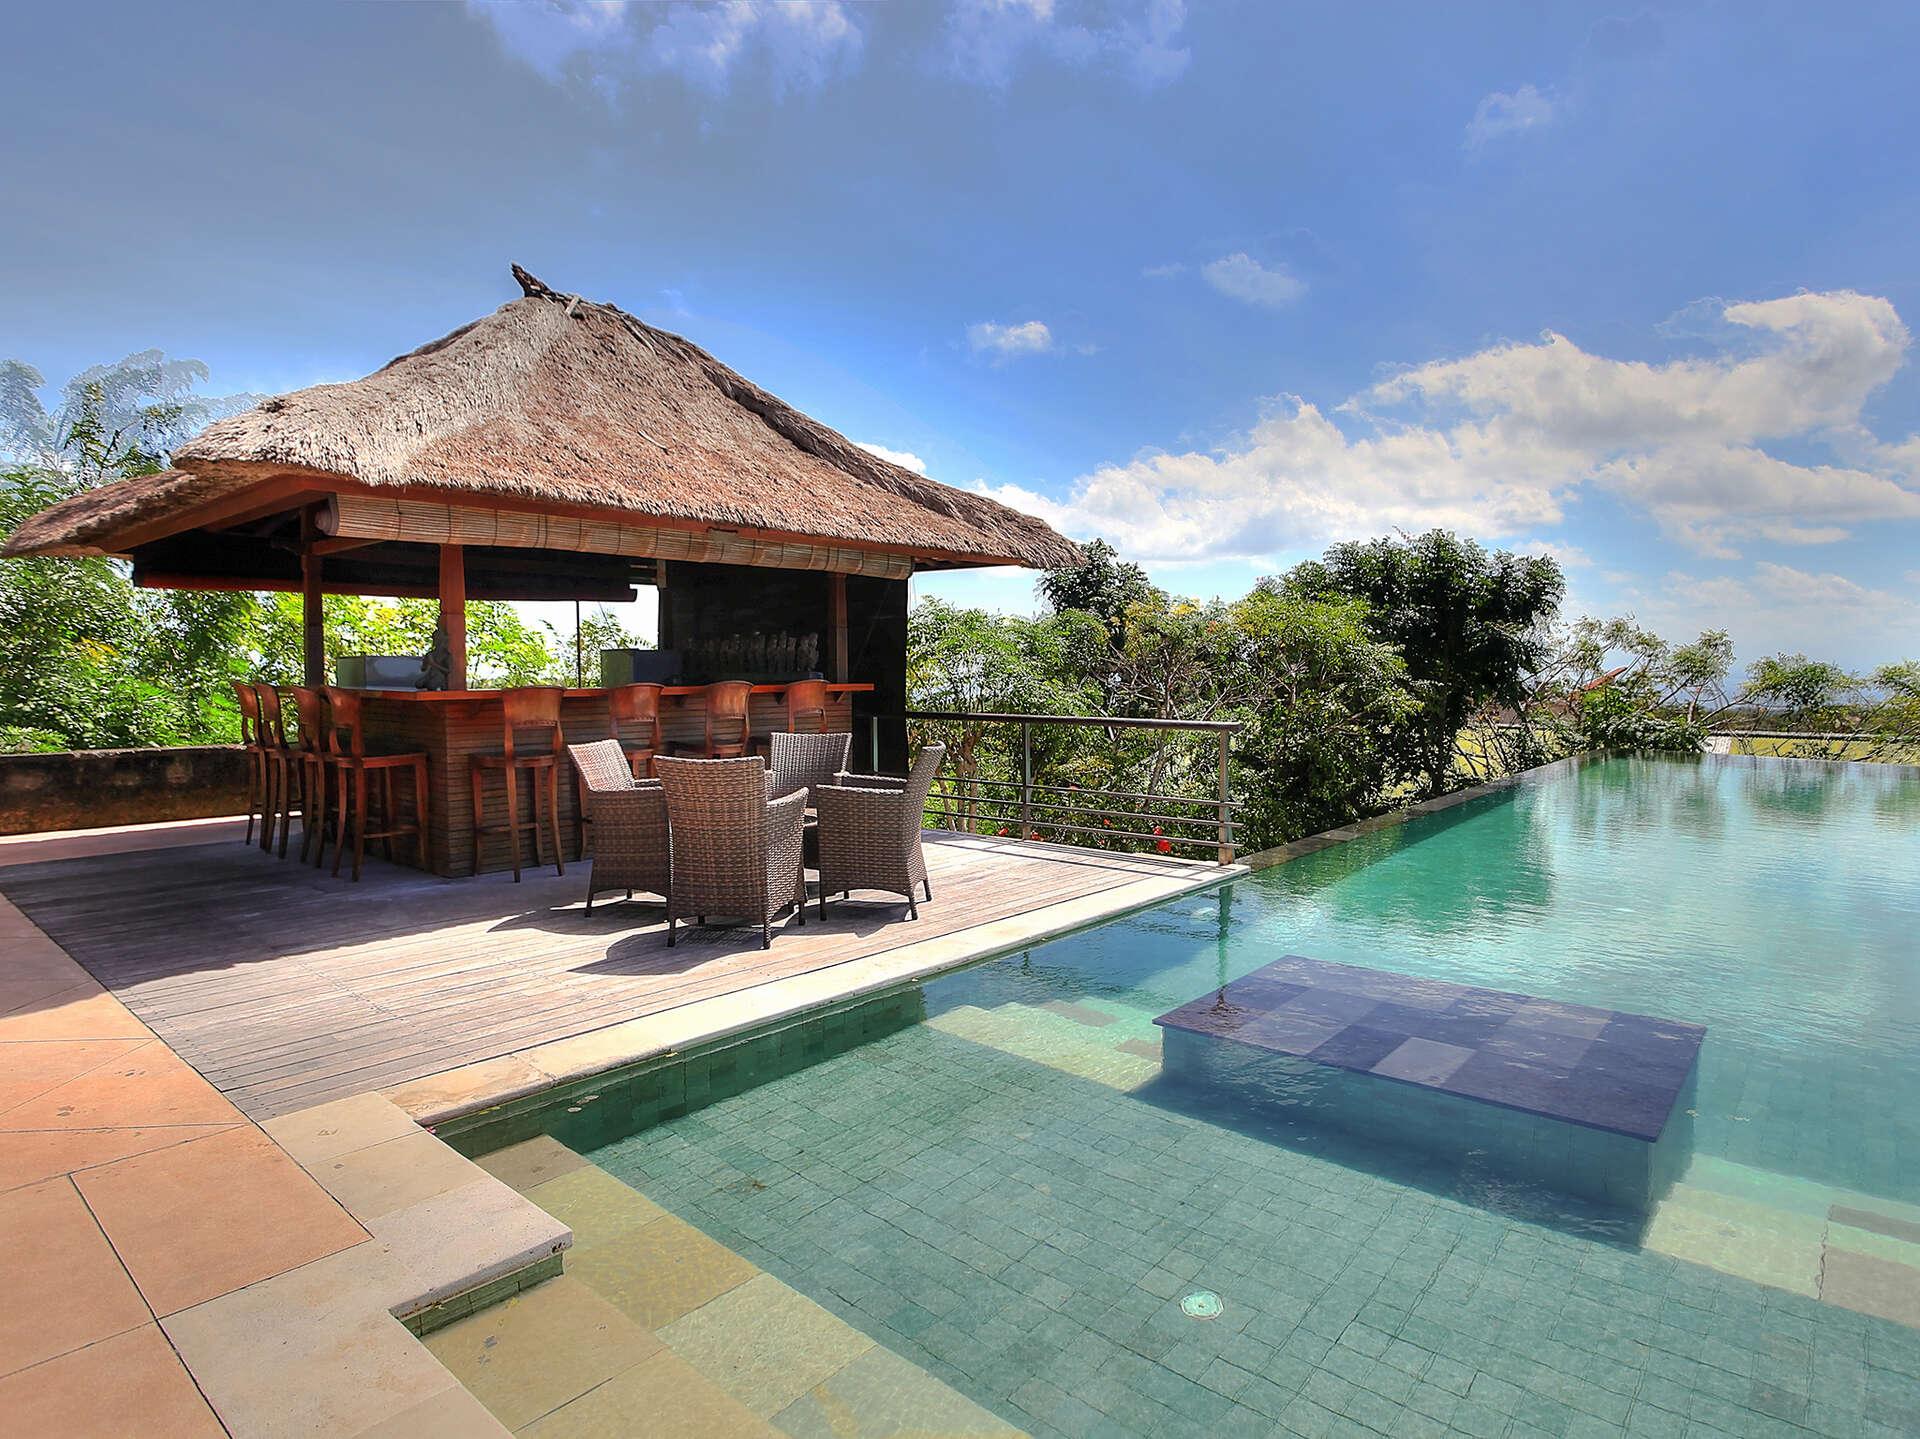 Luxury villa rentals asia - Indonesia - Bali - The bukit - Indah Manis - Image 1/18